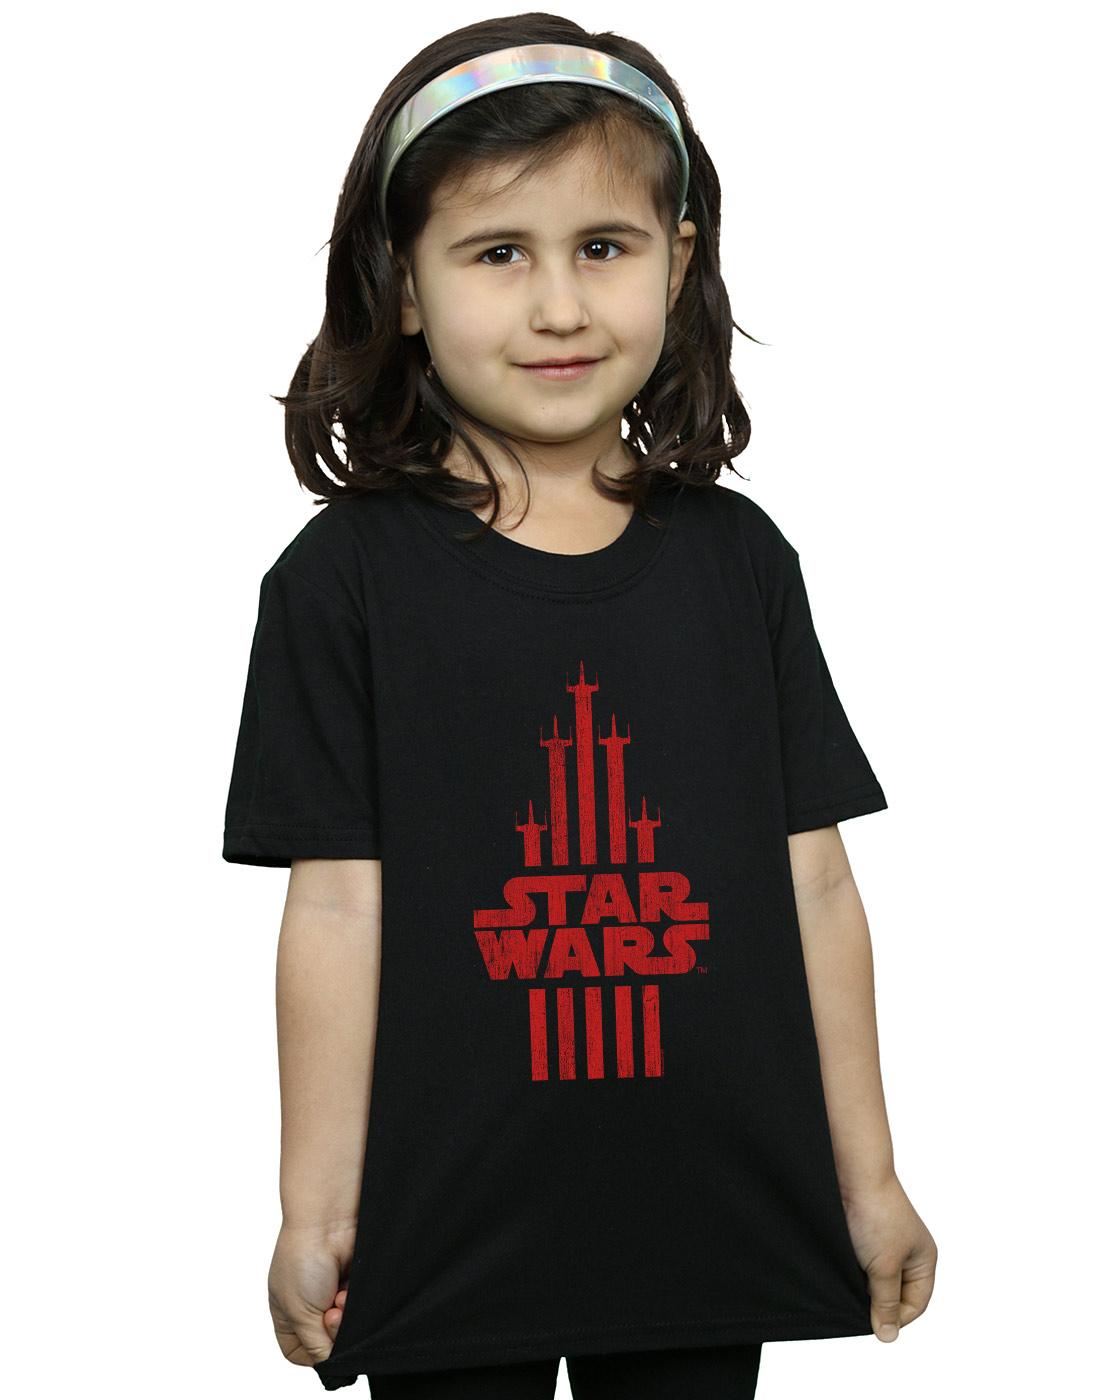 STAR WARS Boys The Last Jedi Gold Chewbacca T-Shirt 9-11 Years Black